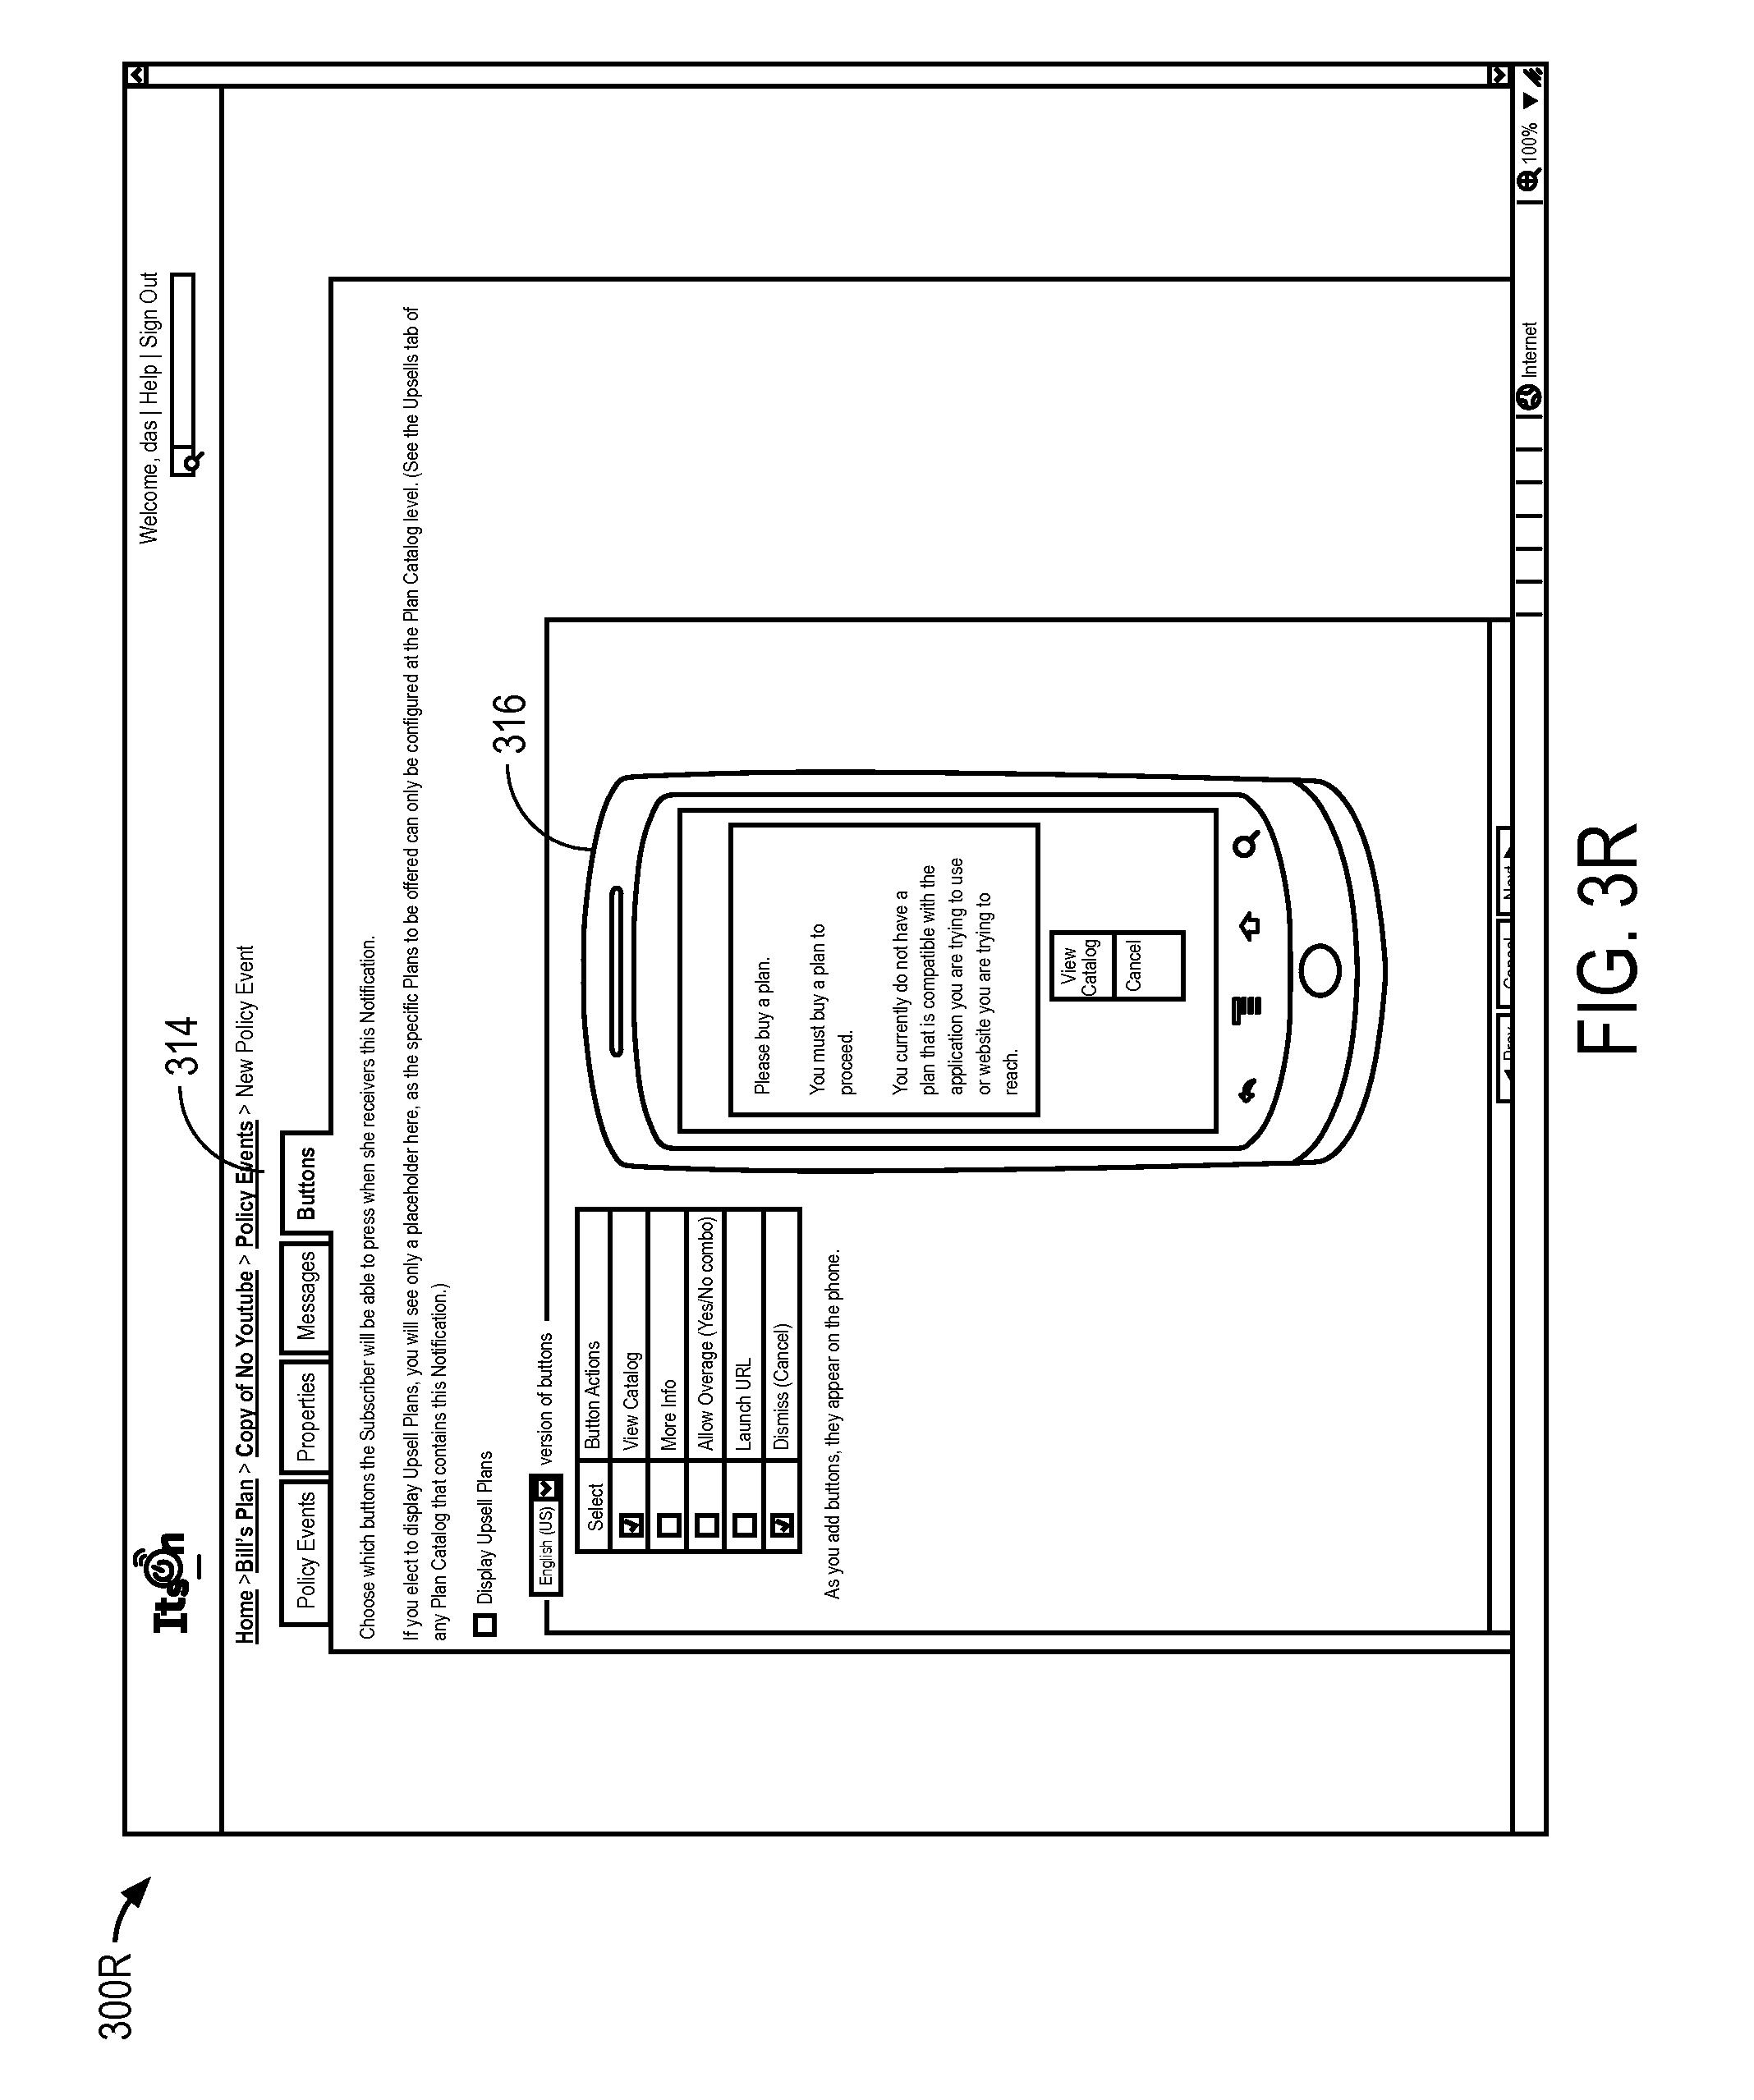 Patent US 8,924,543 B2